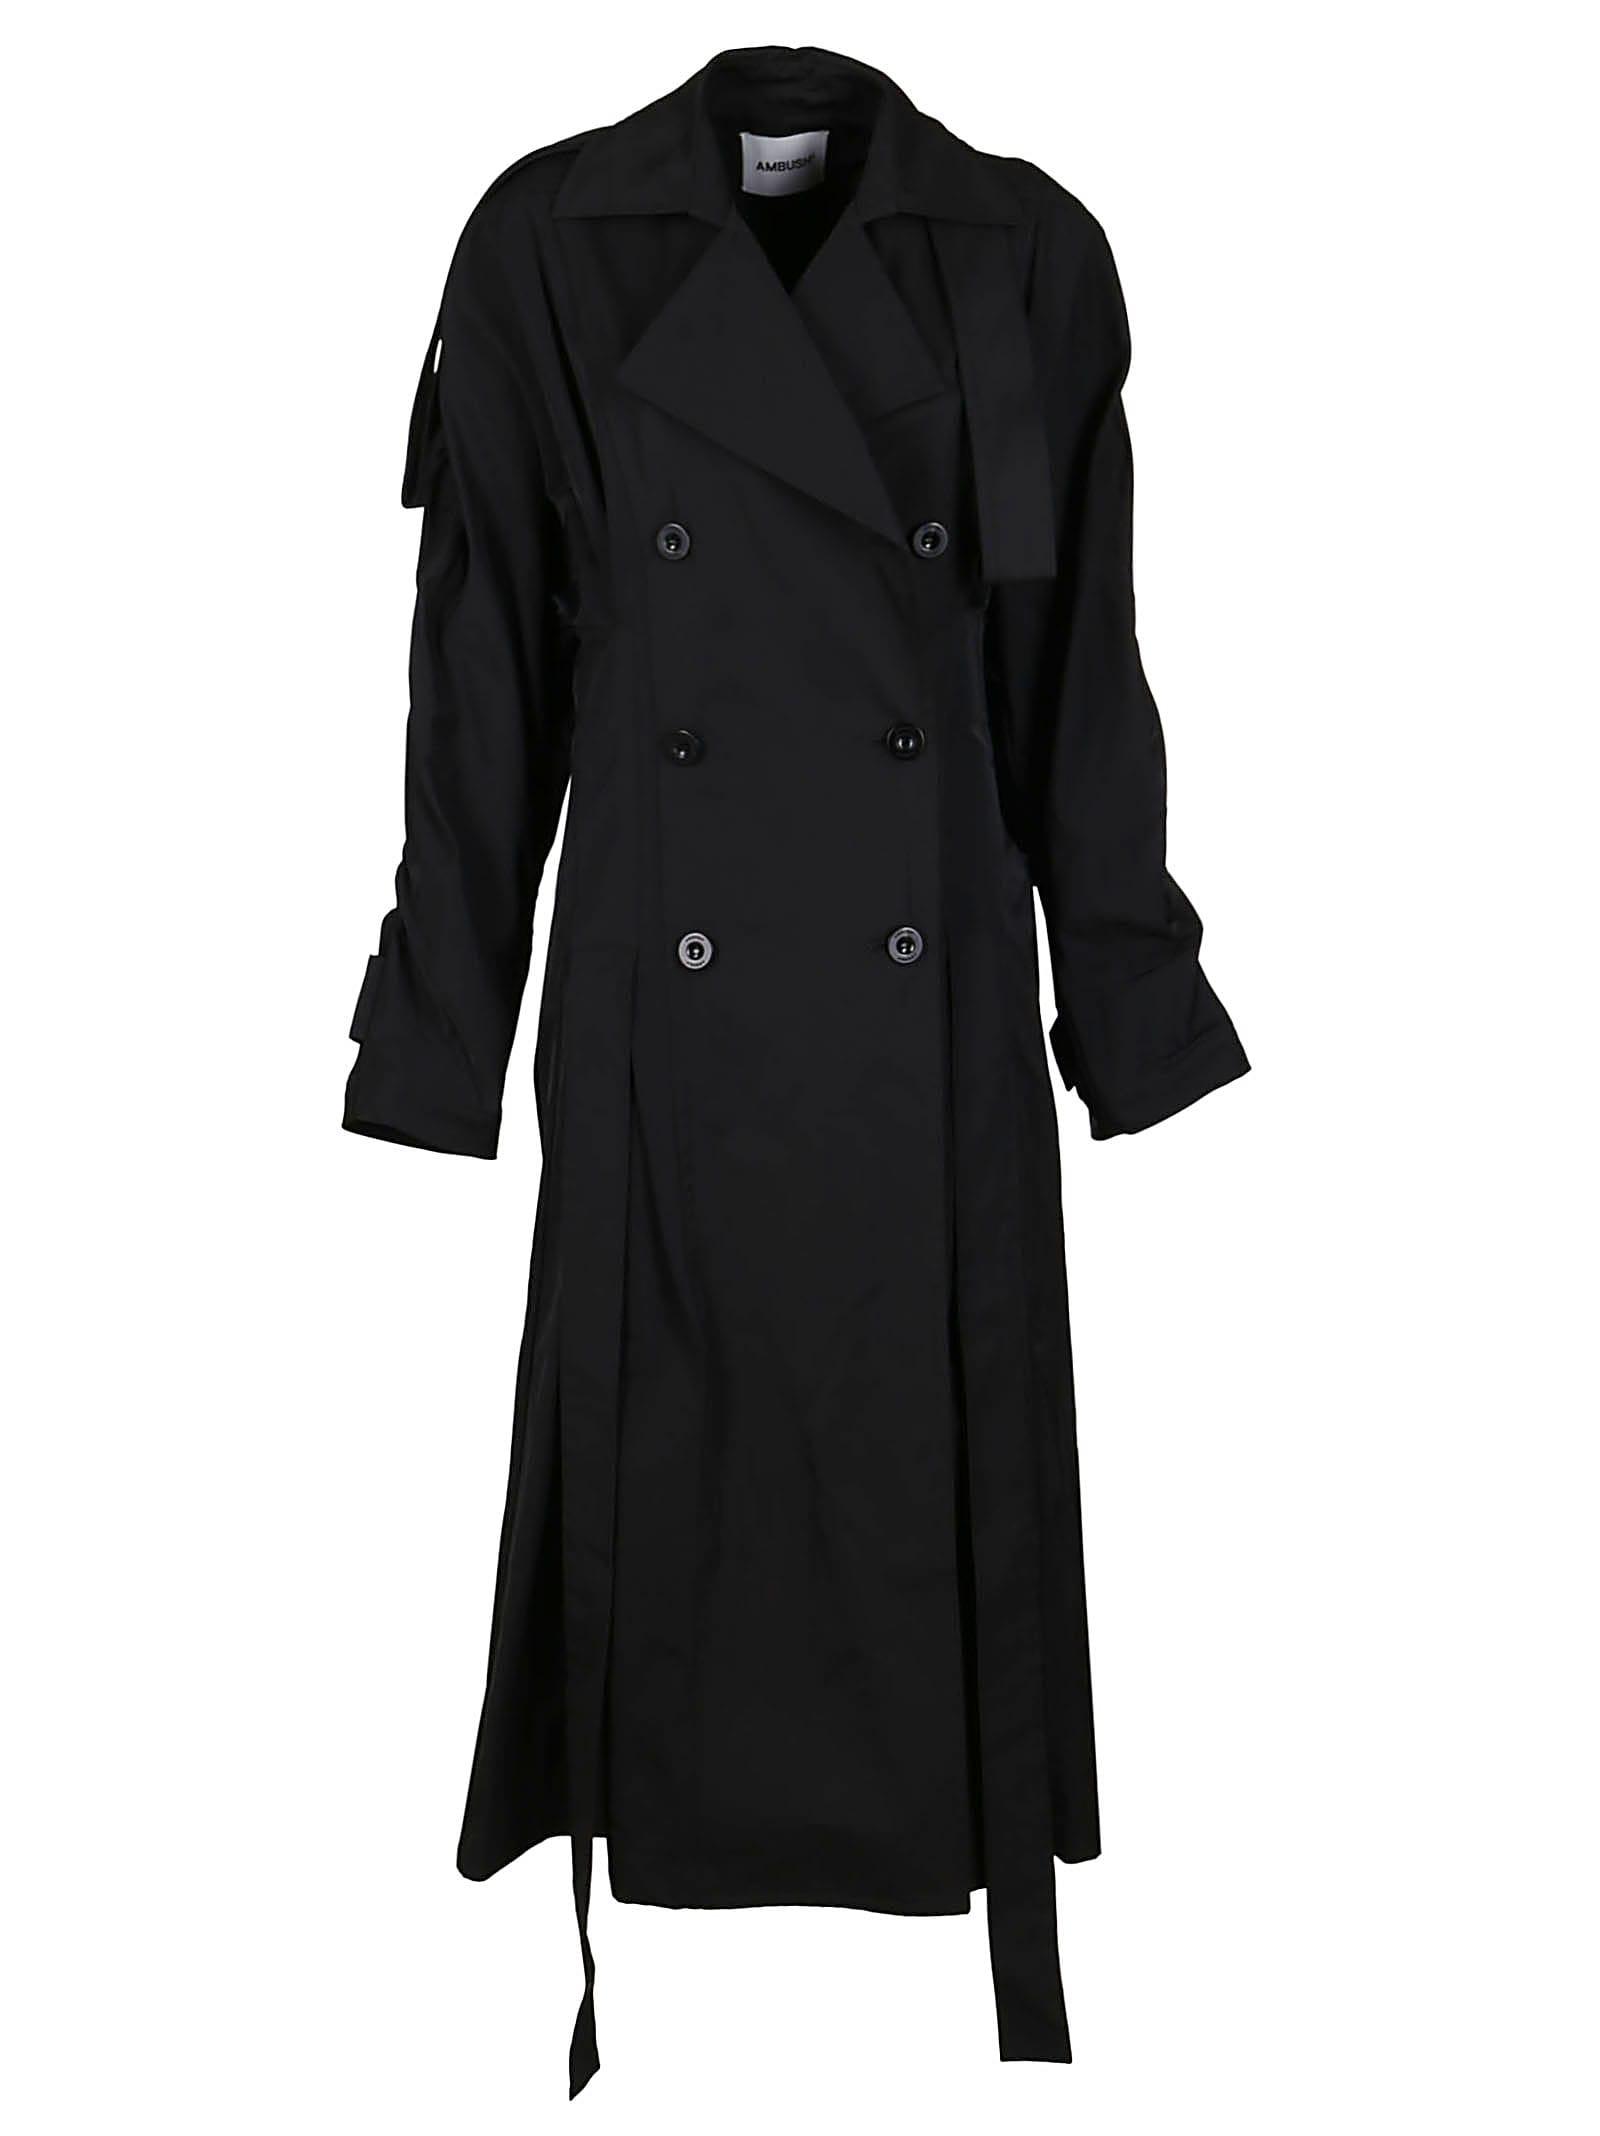 Ambush Coats BLACK COTTON BLEND TRENCH COAT